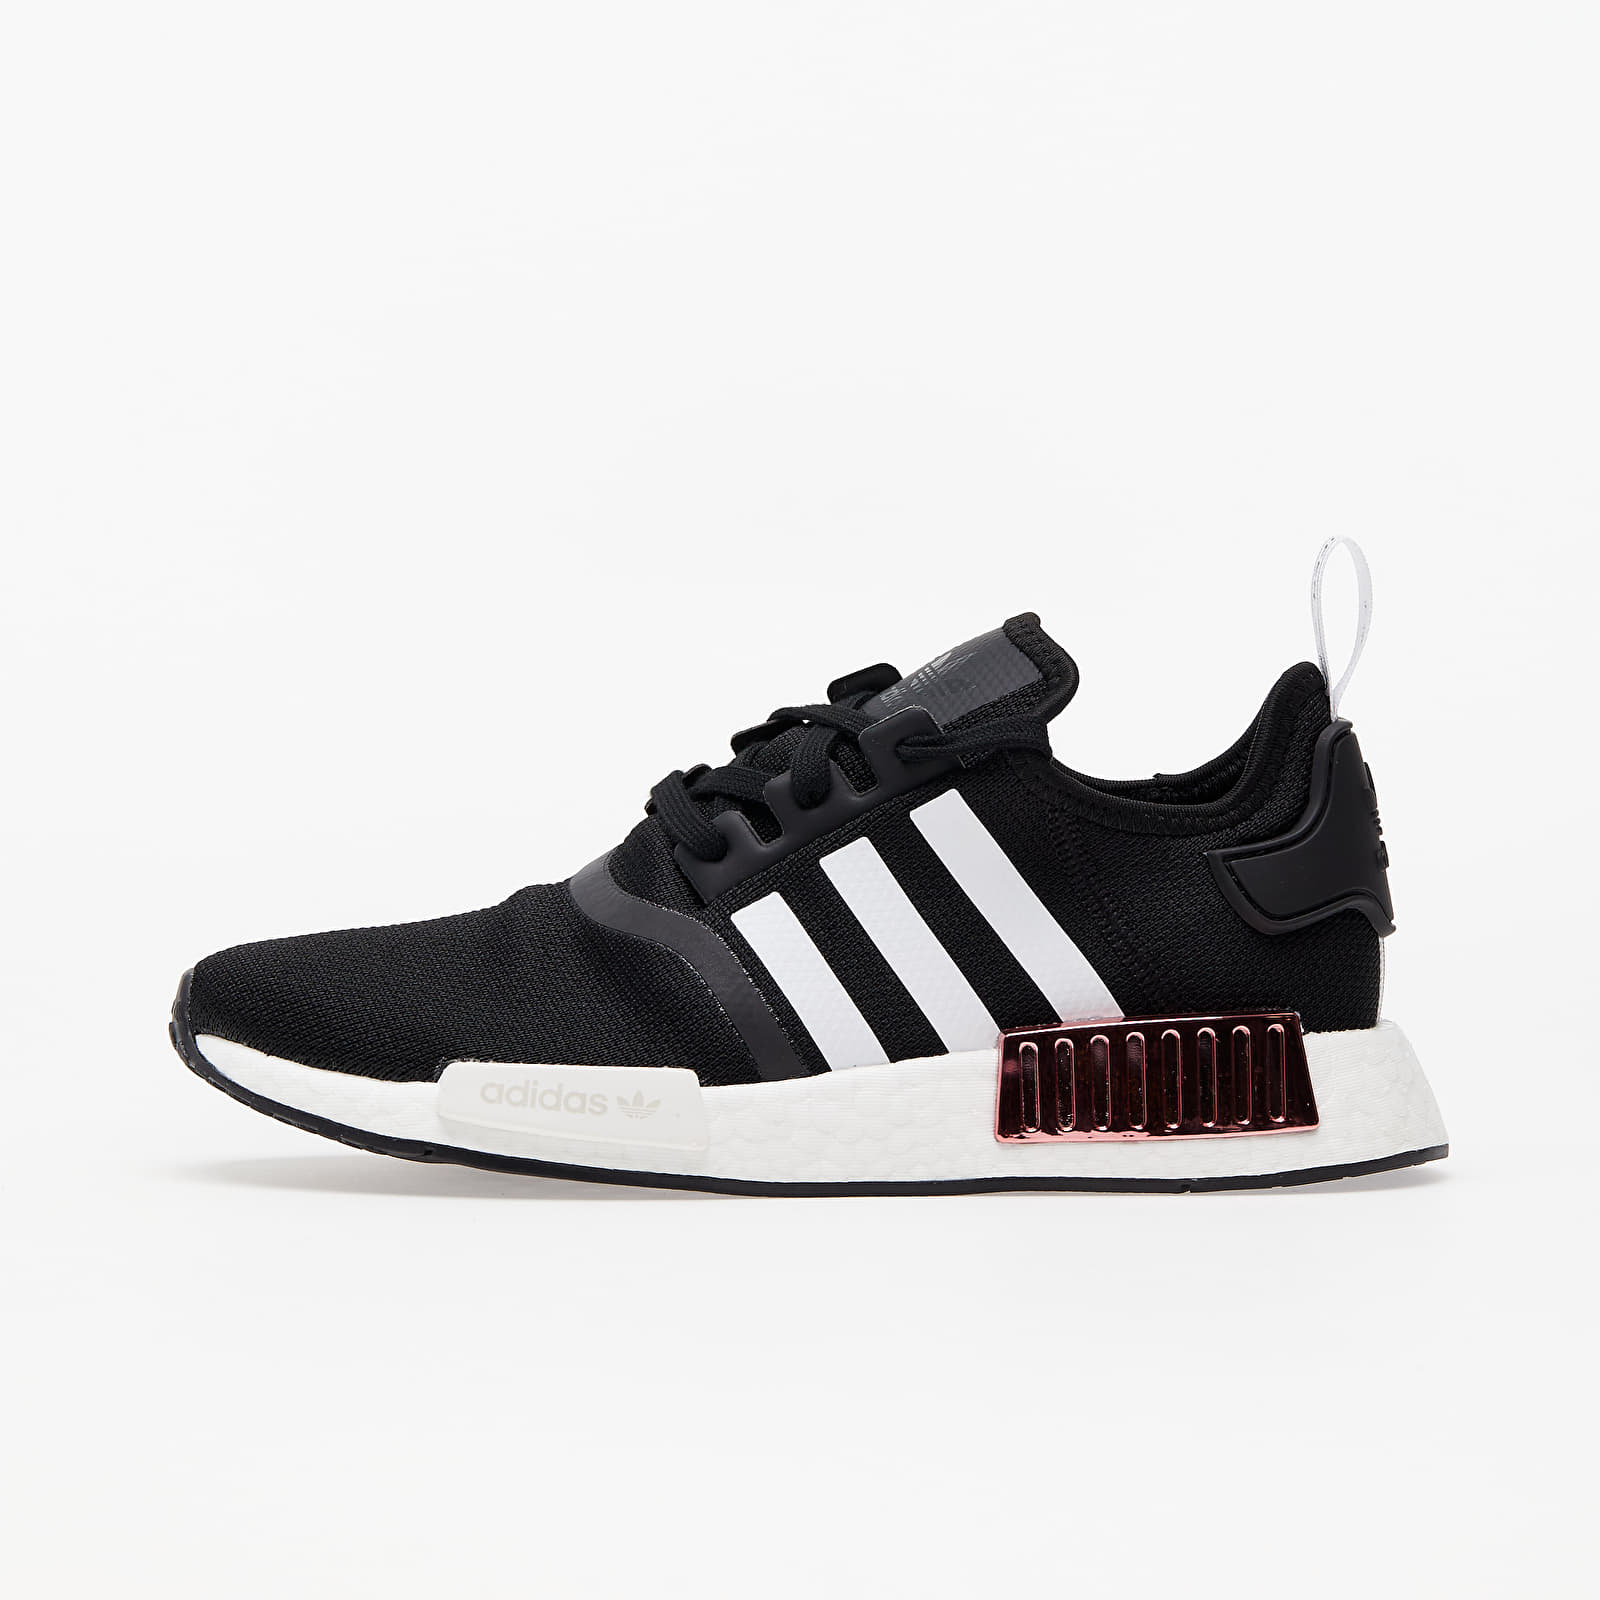 adidas NMD_R1 W Core Black/ Ftwr White/ Hazy Rose FY3771